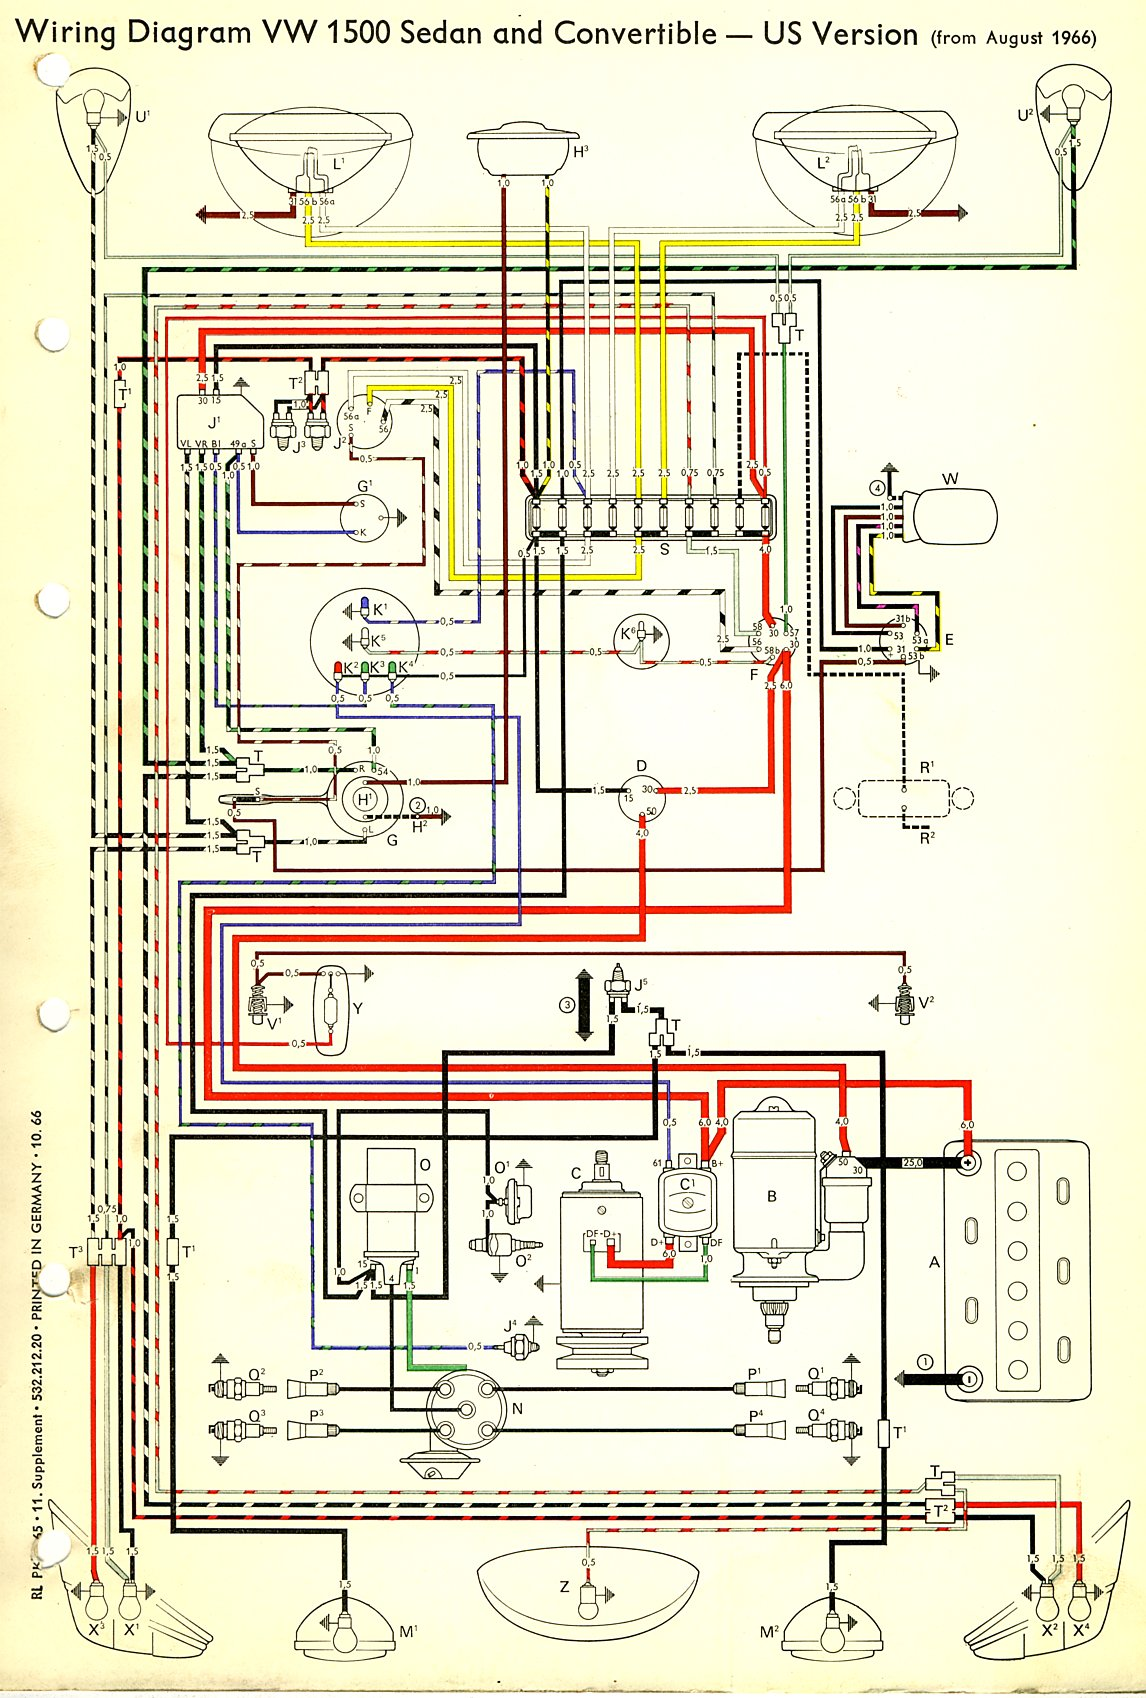 fuel pump wiring harness diagram honeywell non programmable thermostat 1967 beetle (usa) | thegoldenbug.com